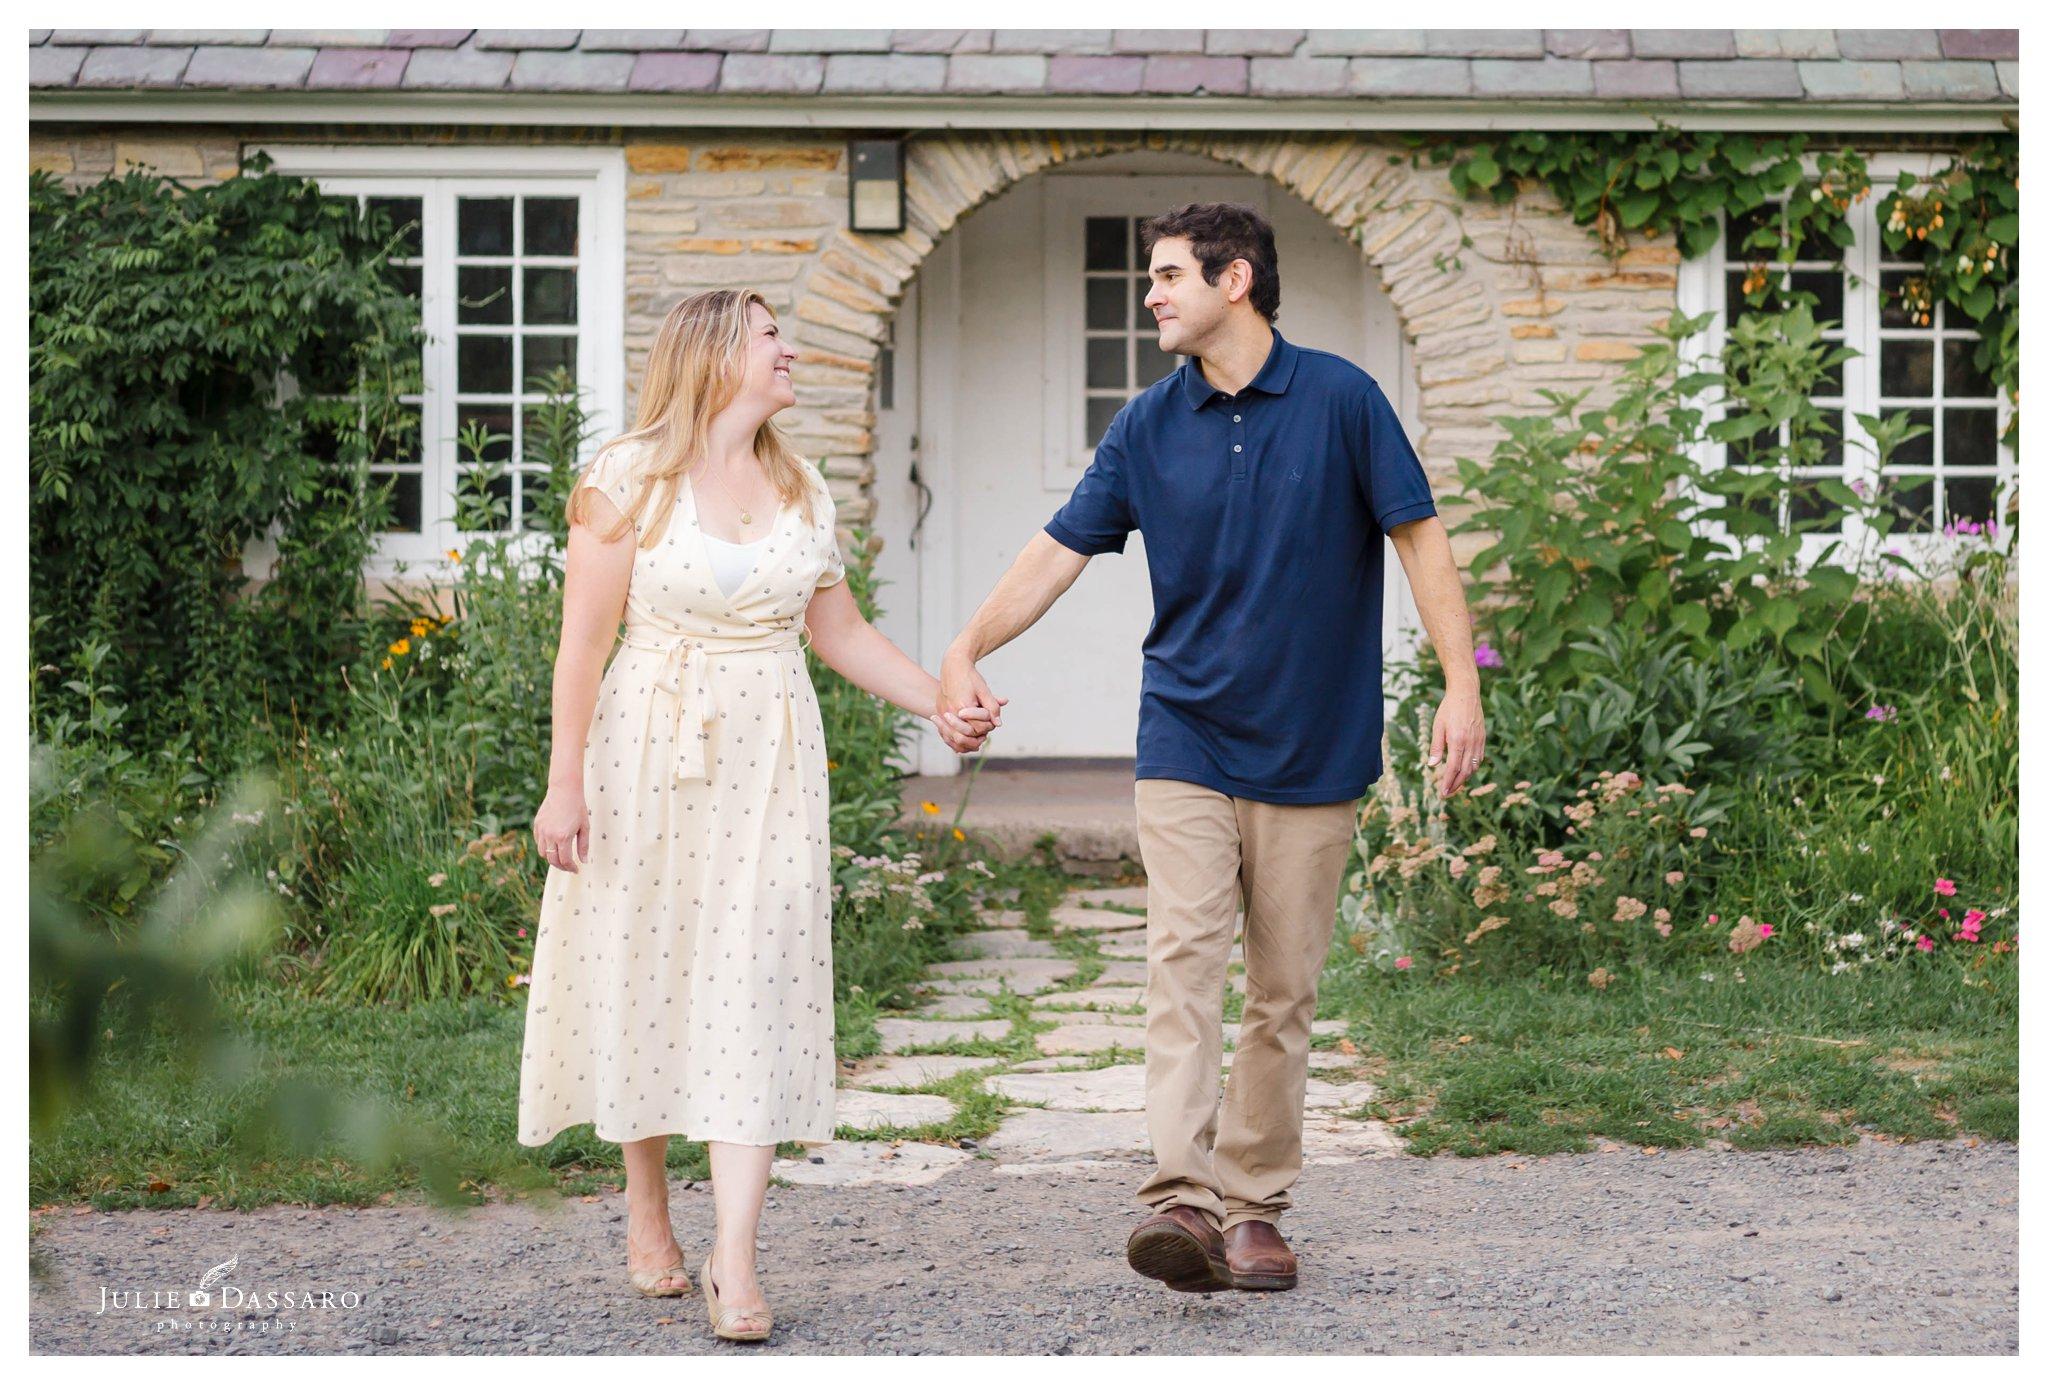 couples portait photographer Mercer Middlesex NJ